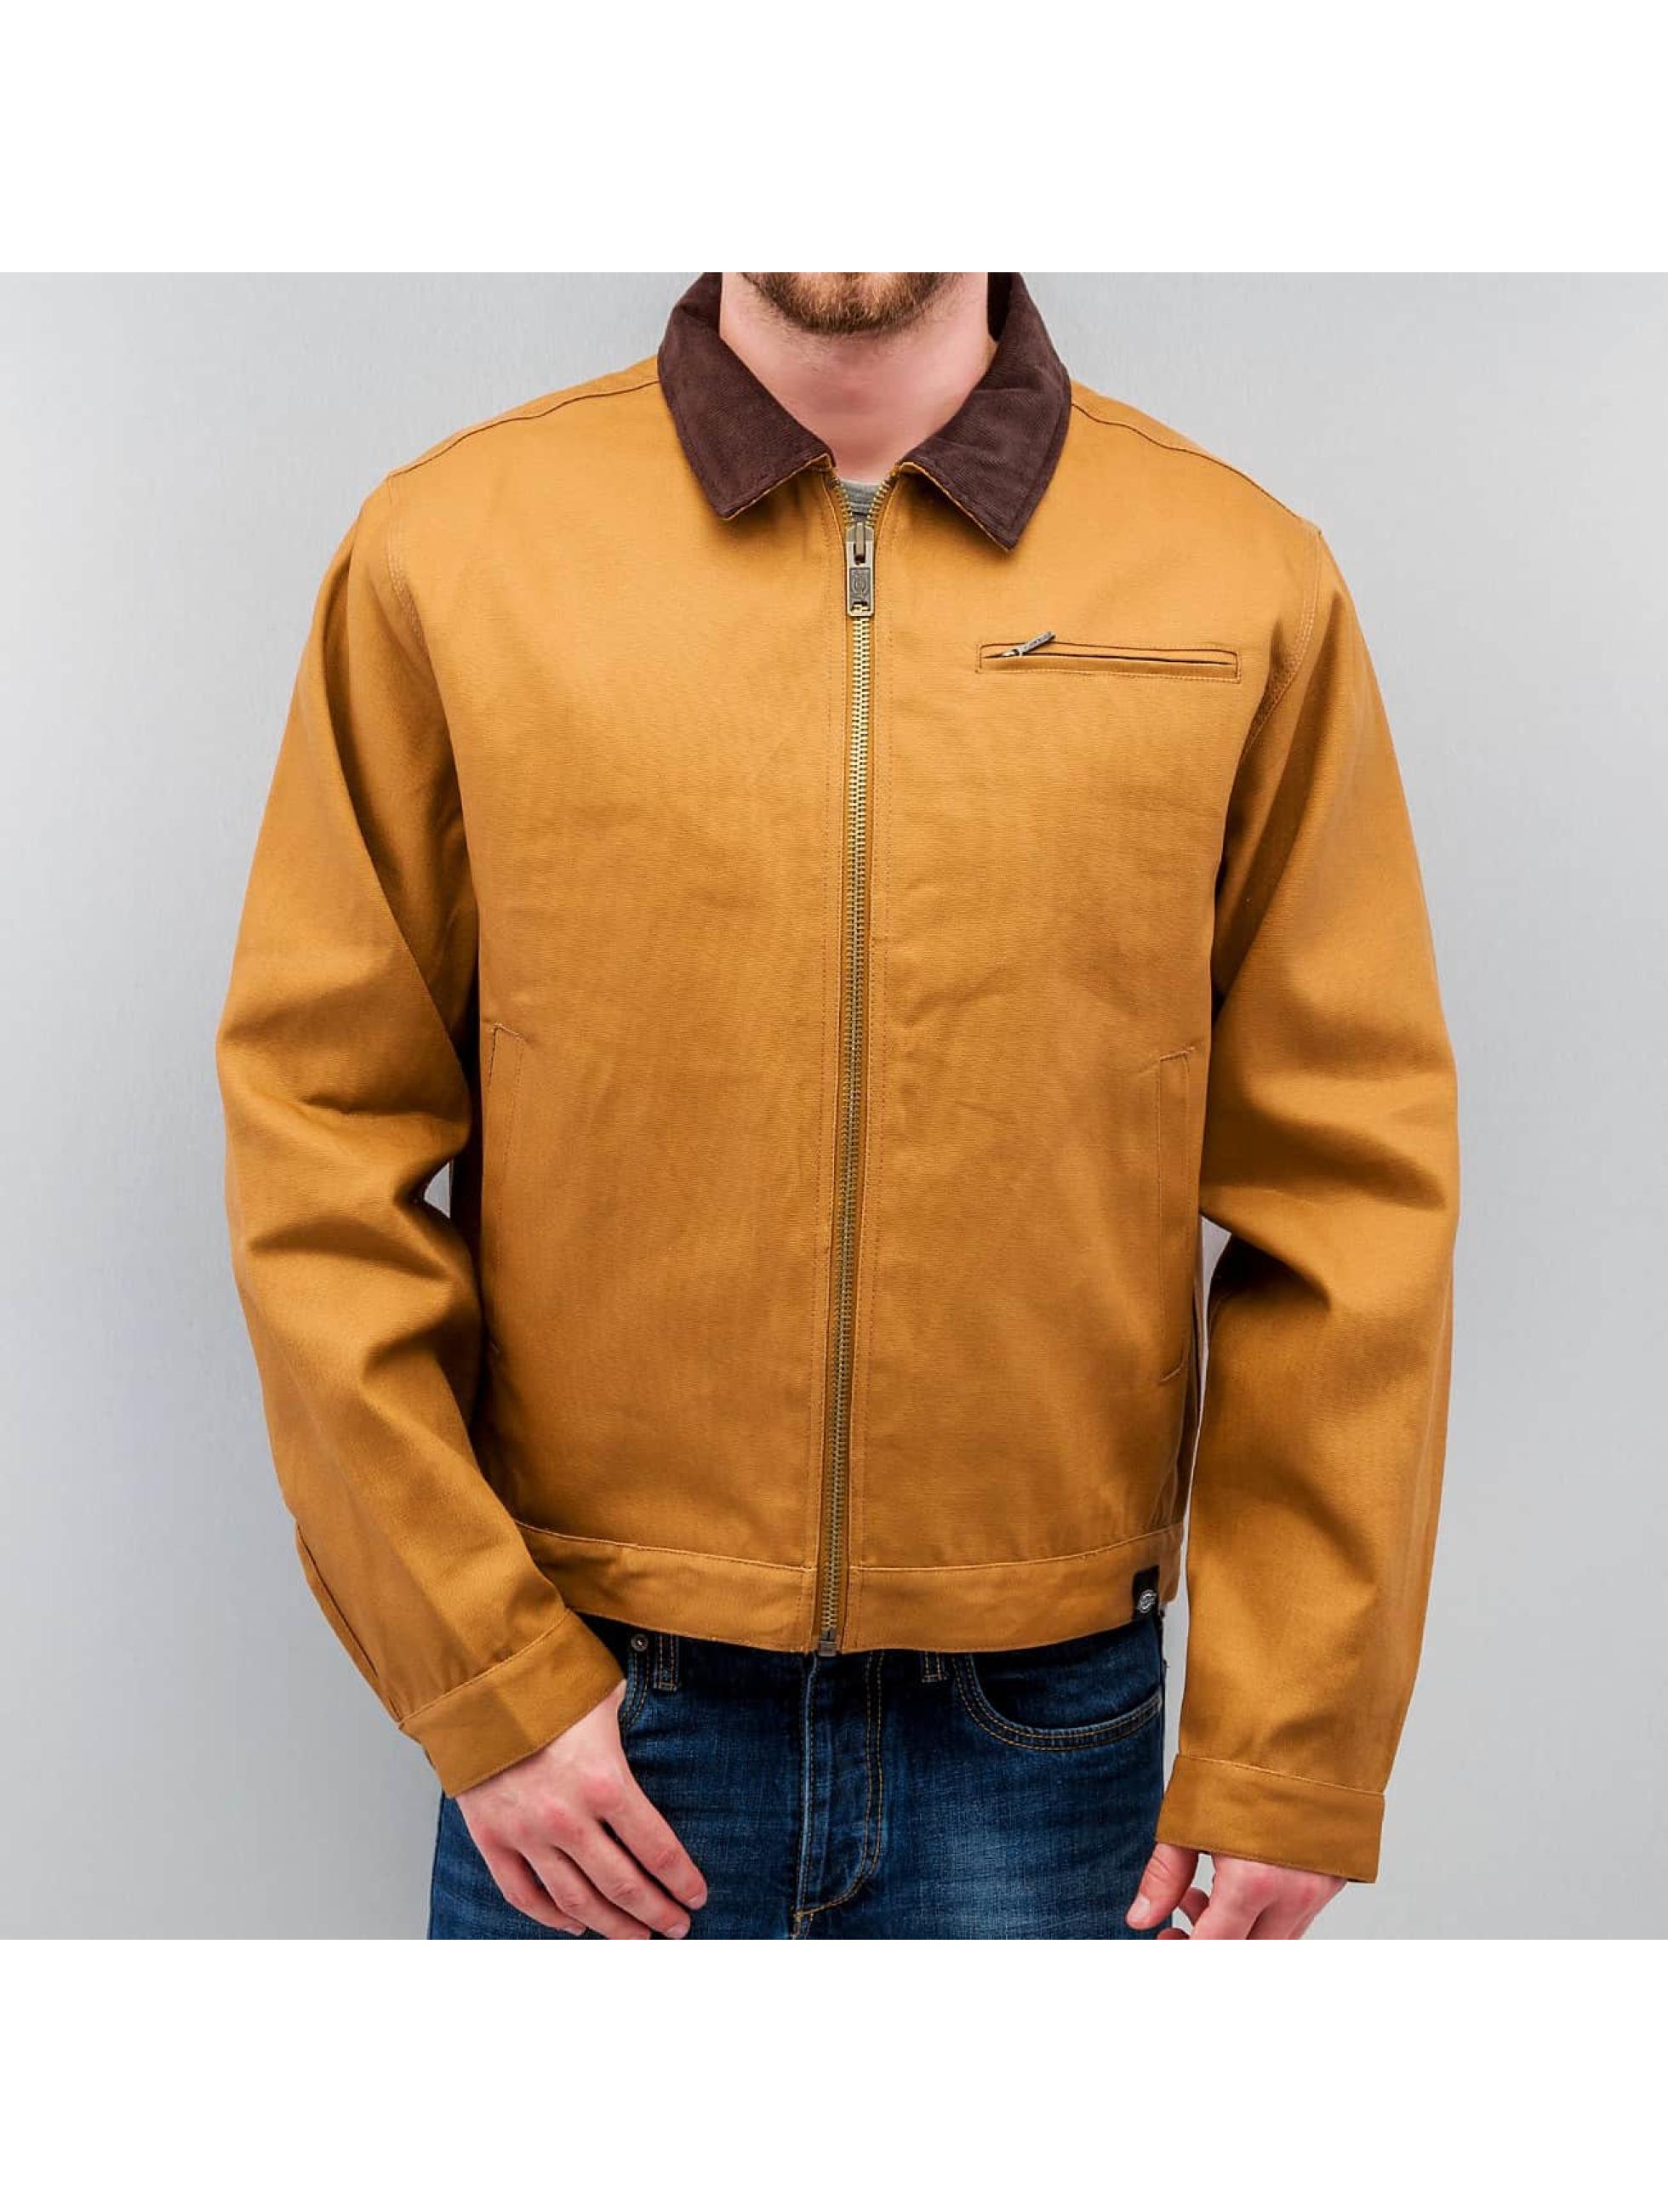 Dickies Демисезонная куртка Blanket Lined Duck коричневый